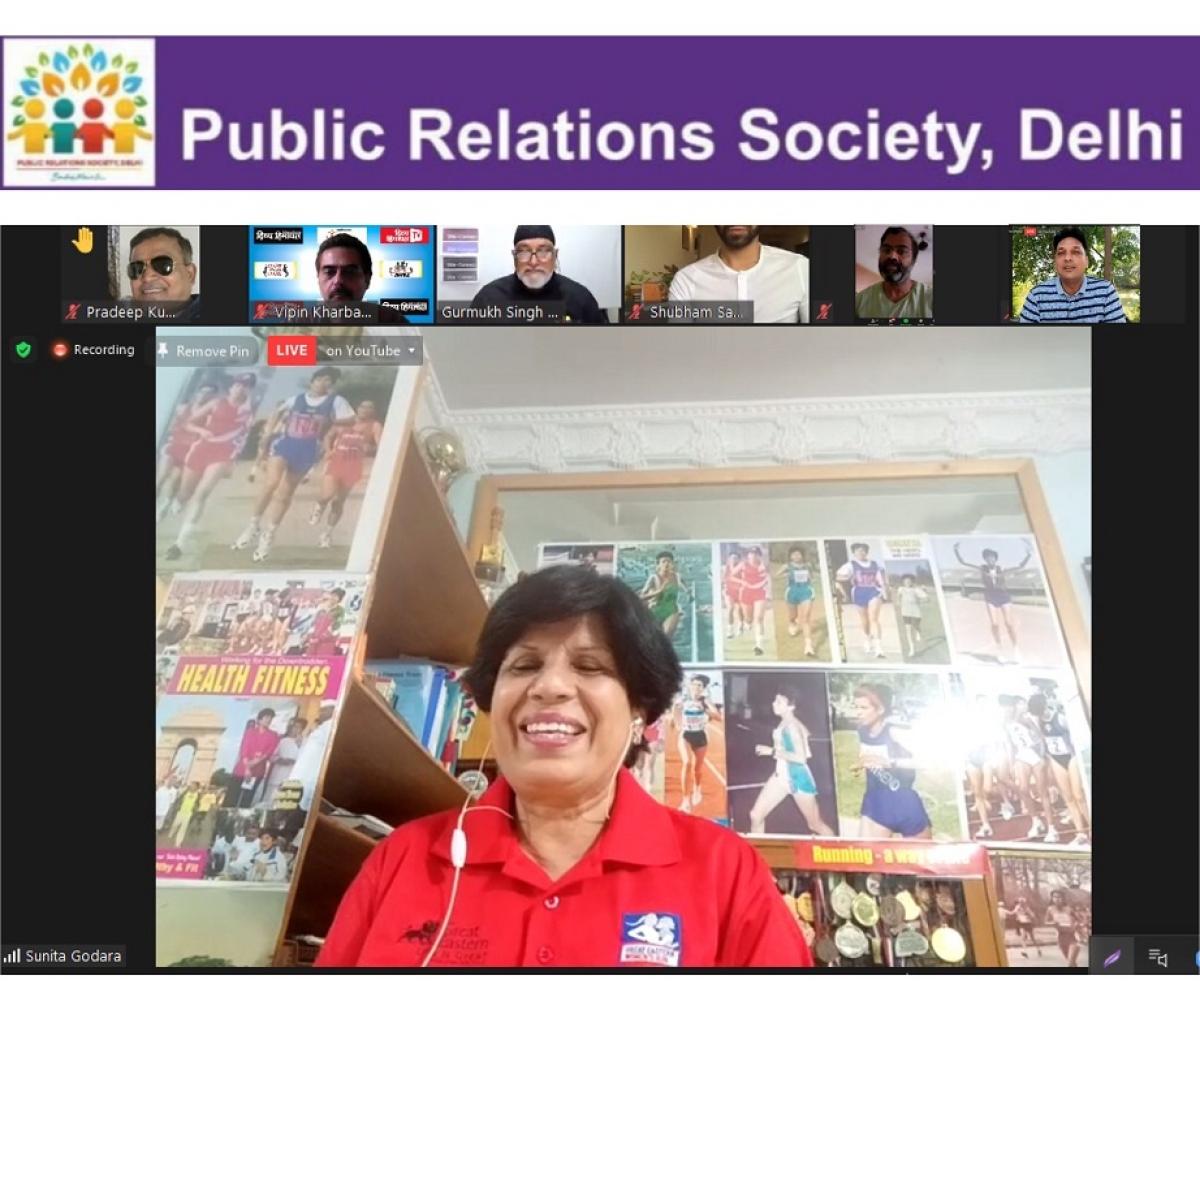 Rich balanced diet and regular exercise dominate at Dr. Sunita Godara's Webinar organised by the PR Society Delhi